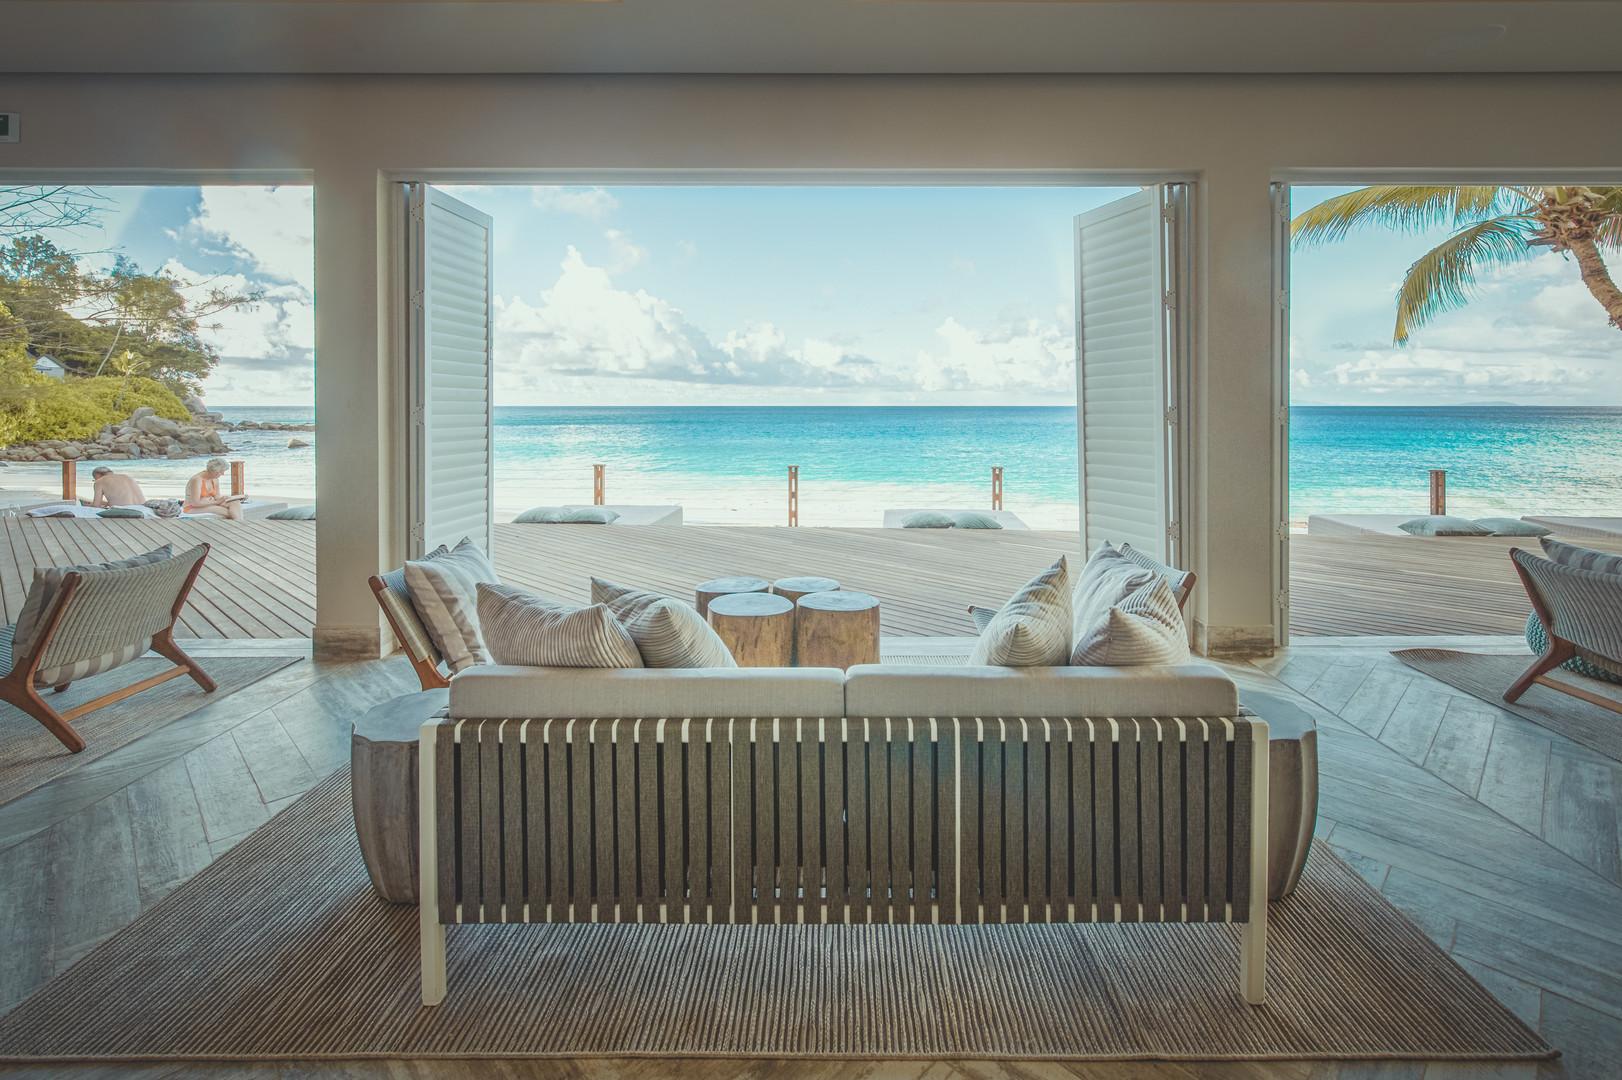 Carana Beach Hotel #3